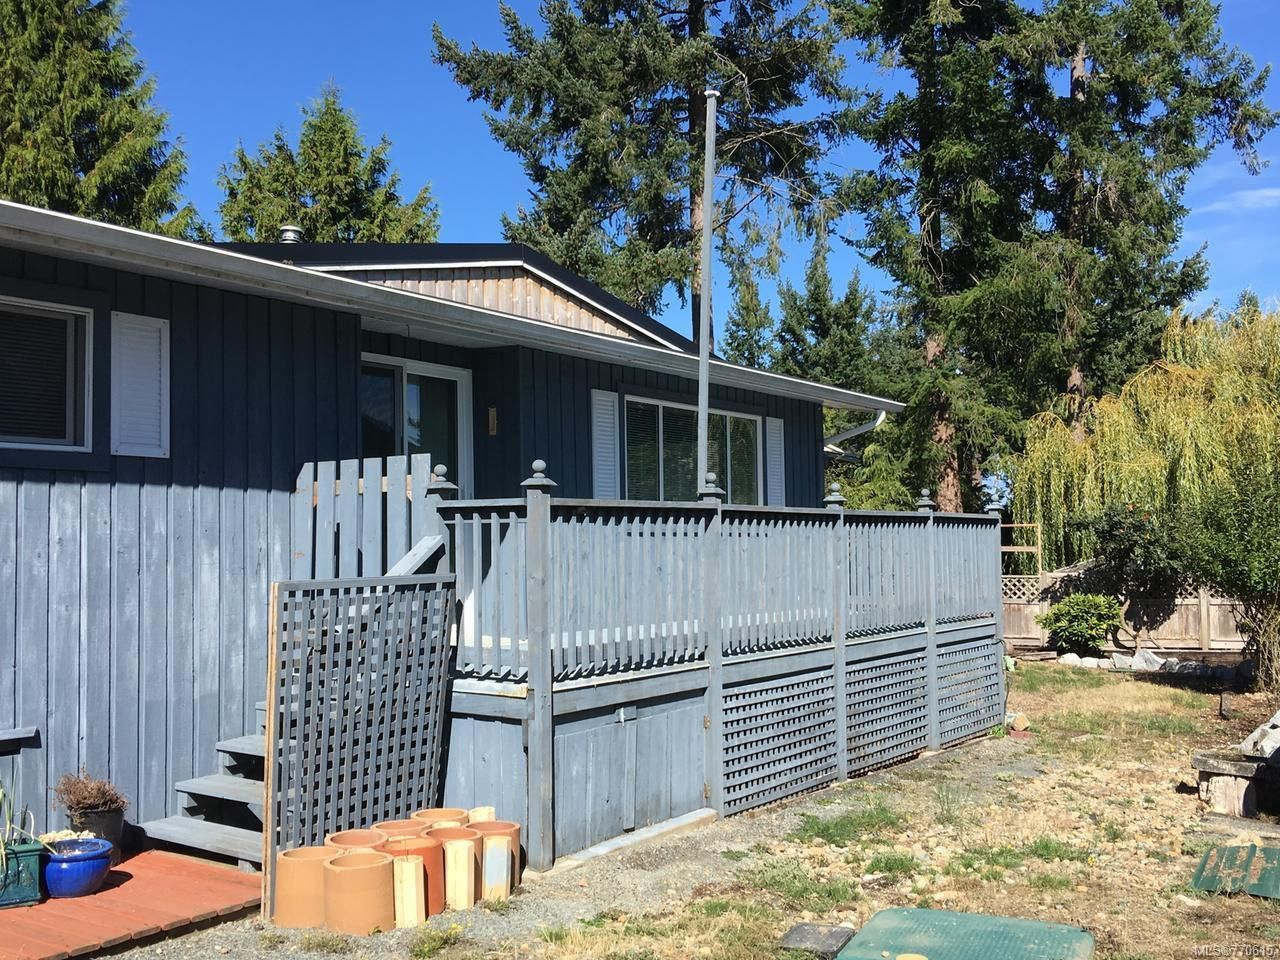 Photo 1: Photos: 1404 Pilot Way in NANOOSE BAY: PQ Nanoose House for sale (Parksville/Qualicum)  : MLS®# 770615